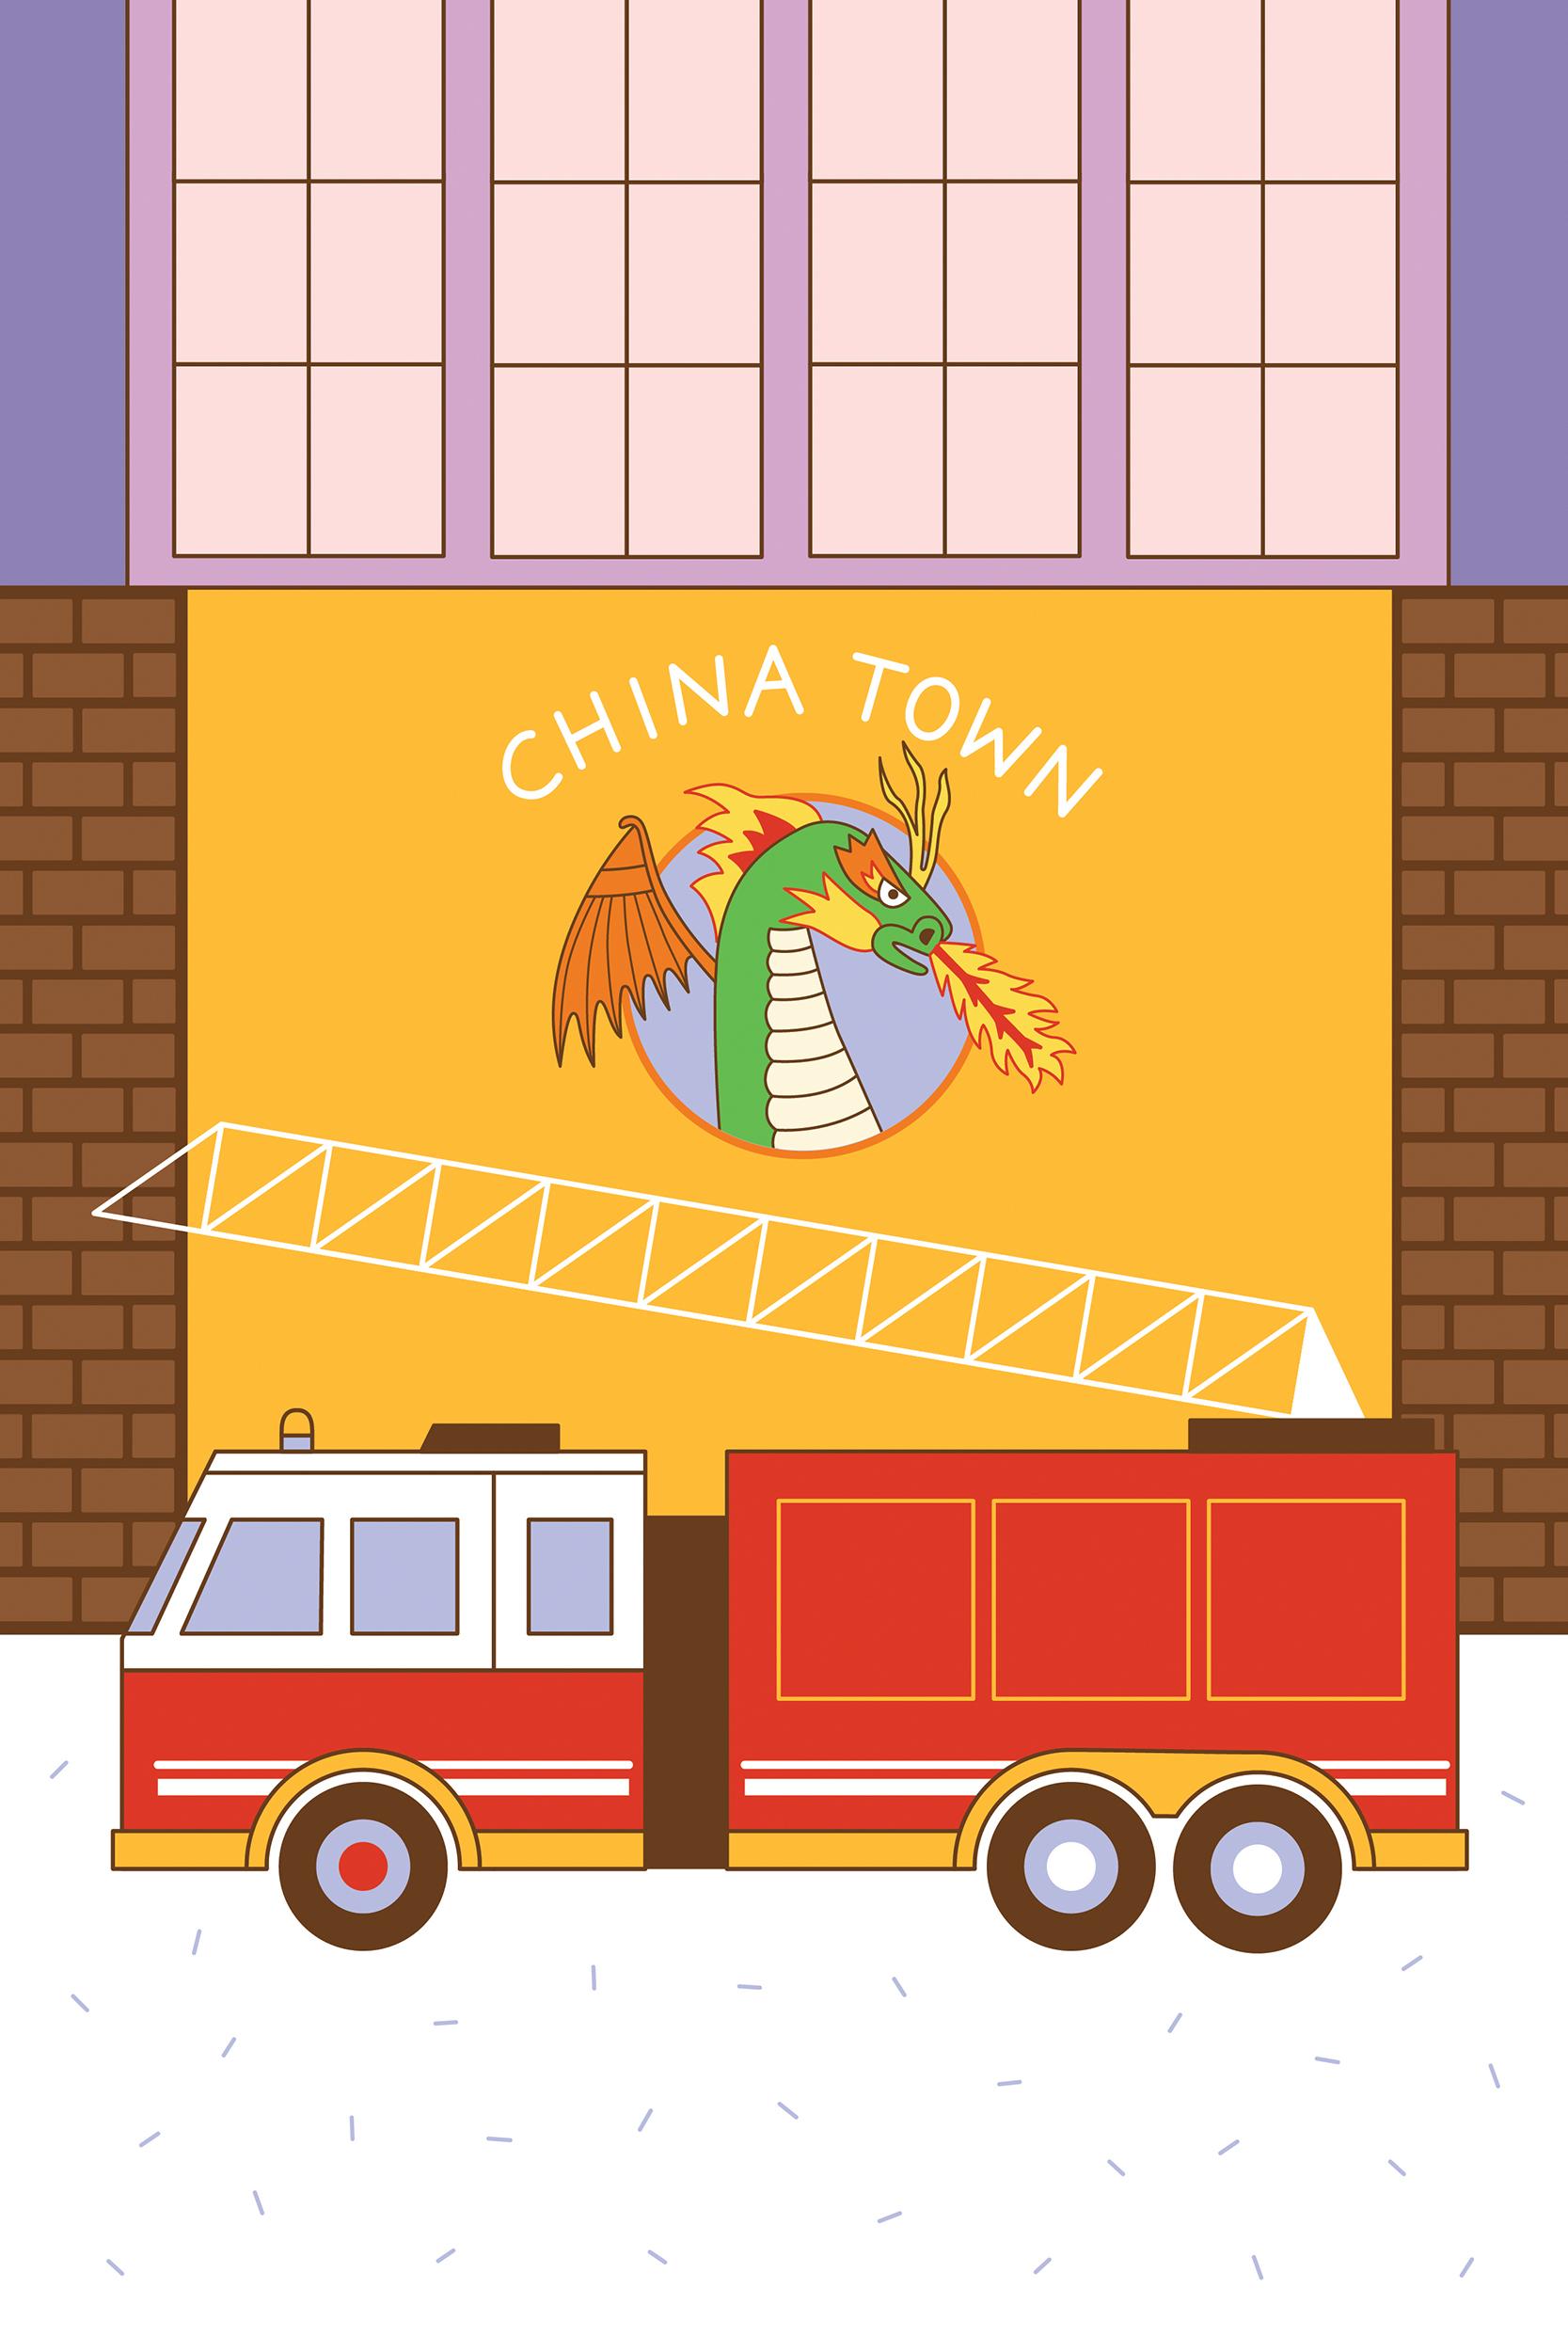 Gateways to Chinatown 0630-20.jpg